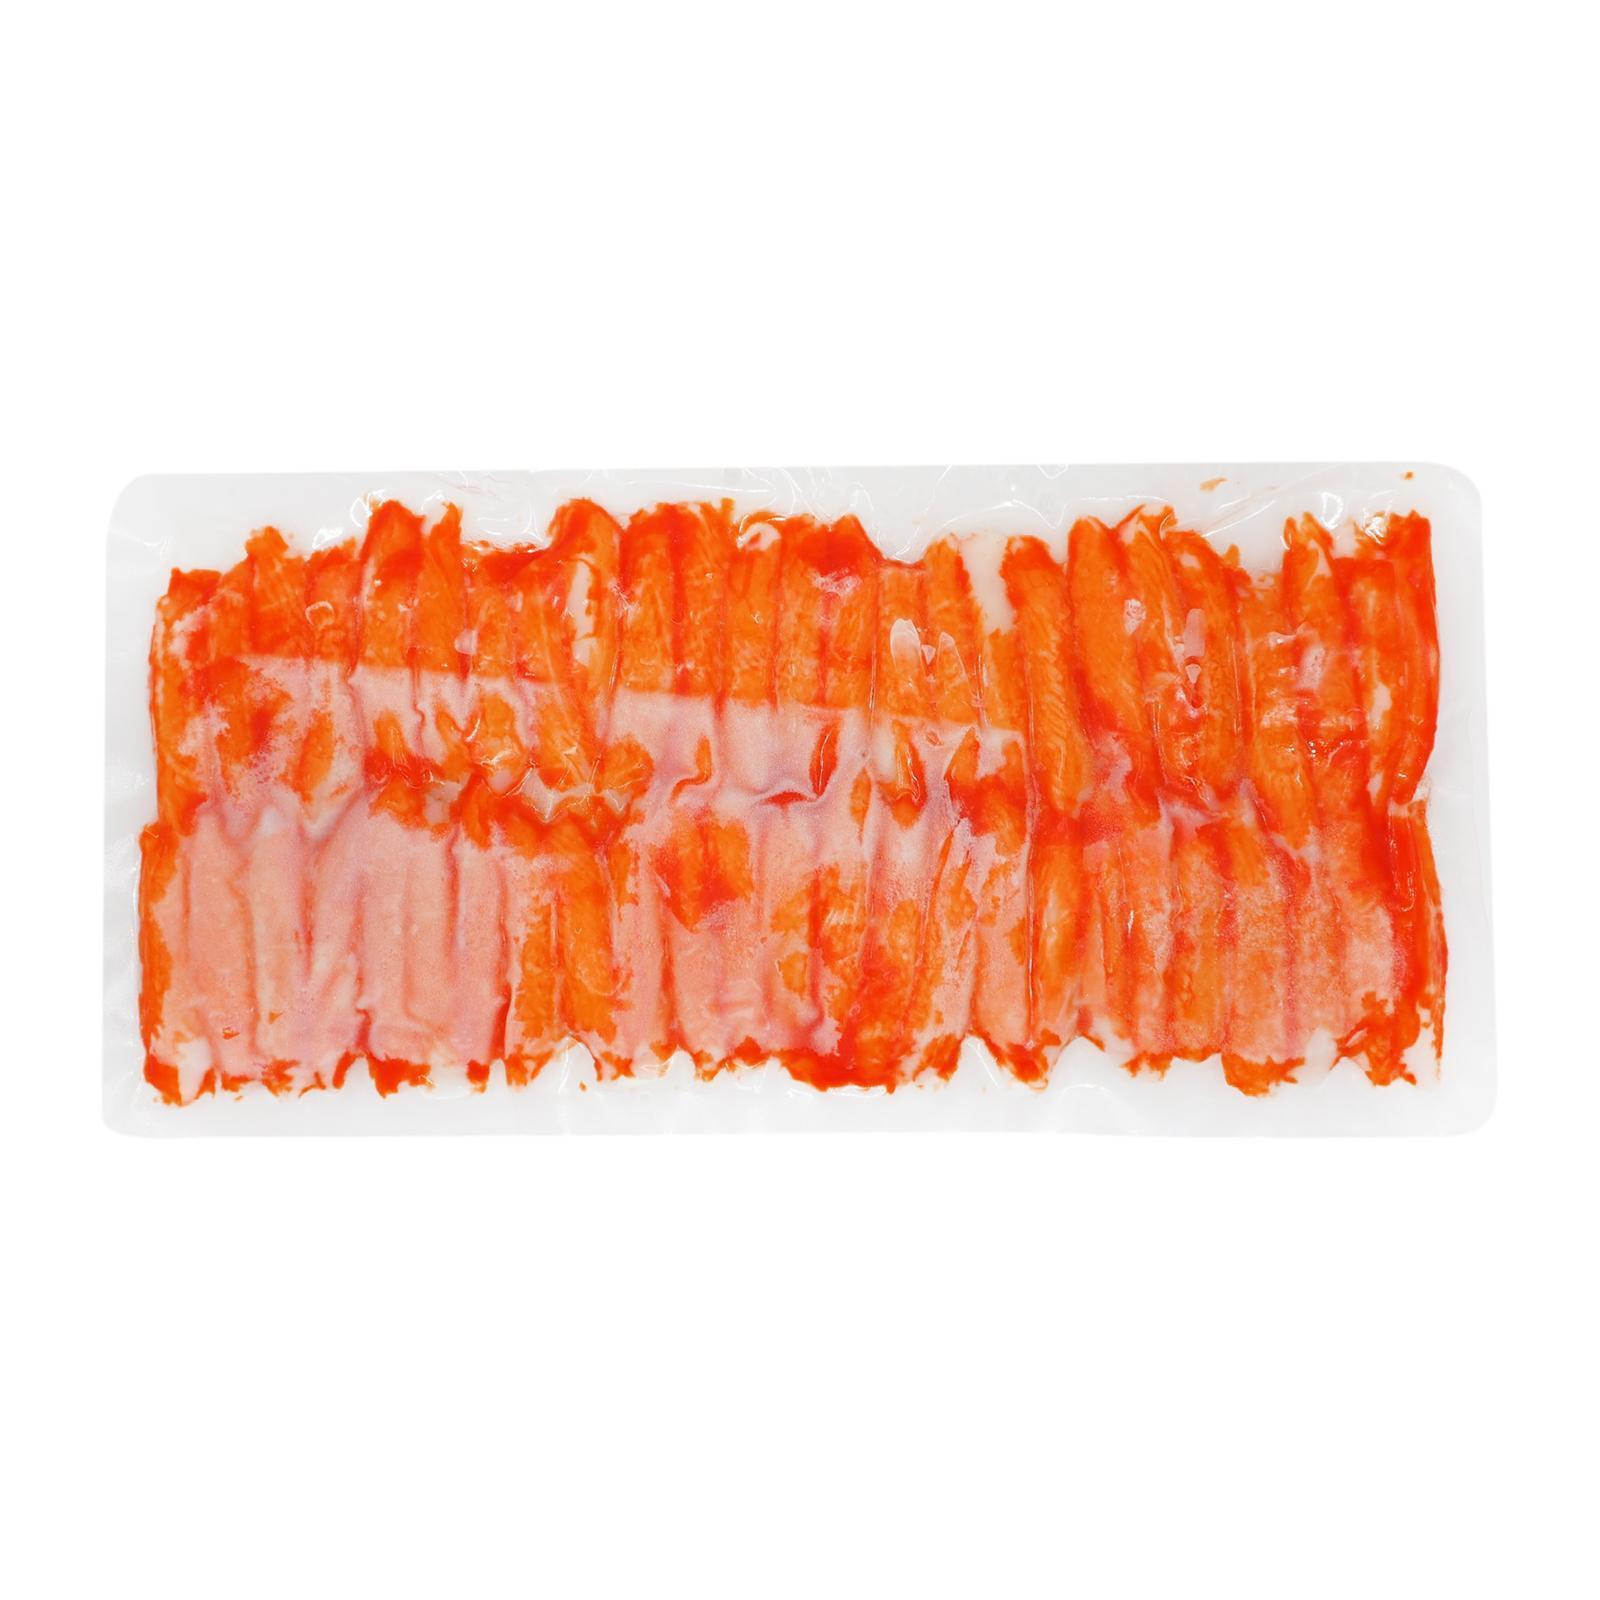 Seaboss Crabmeat Stick (kani Kamaboko) - Frozen By Redmart.